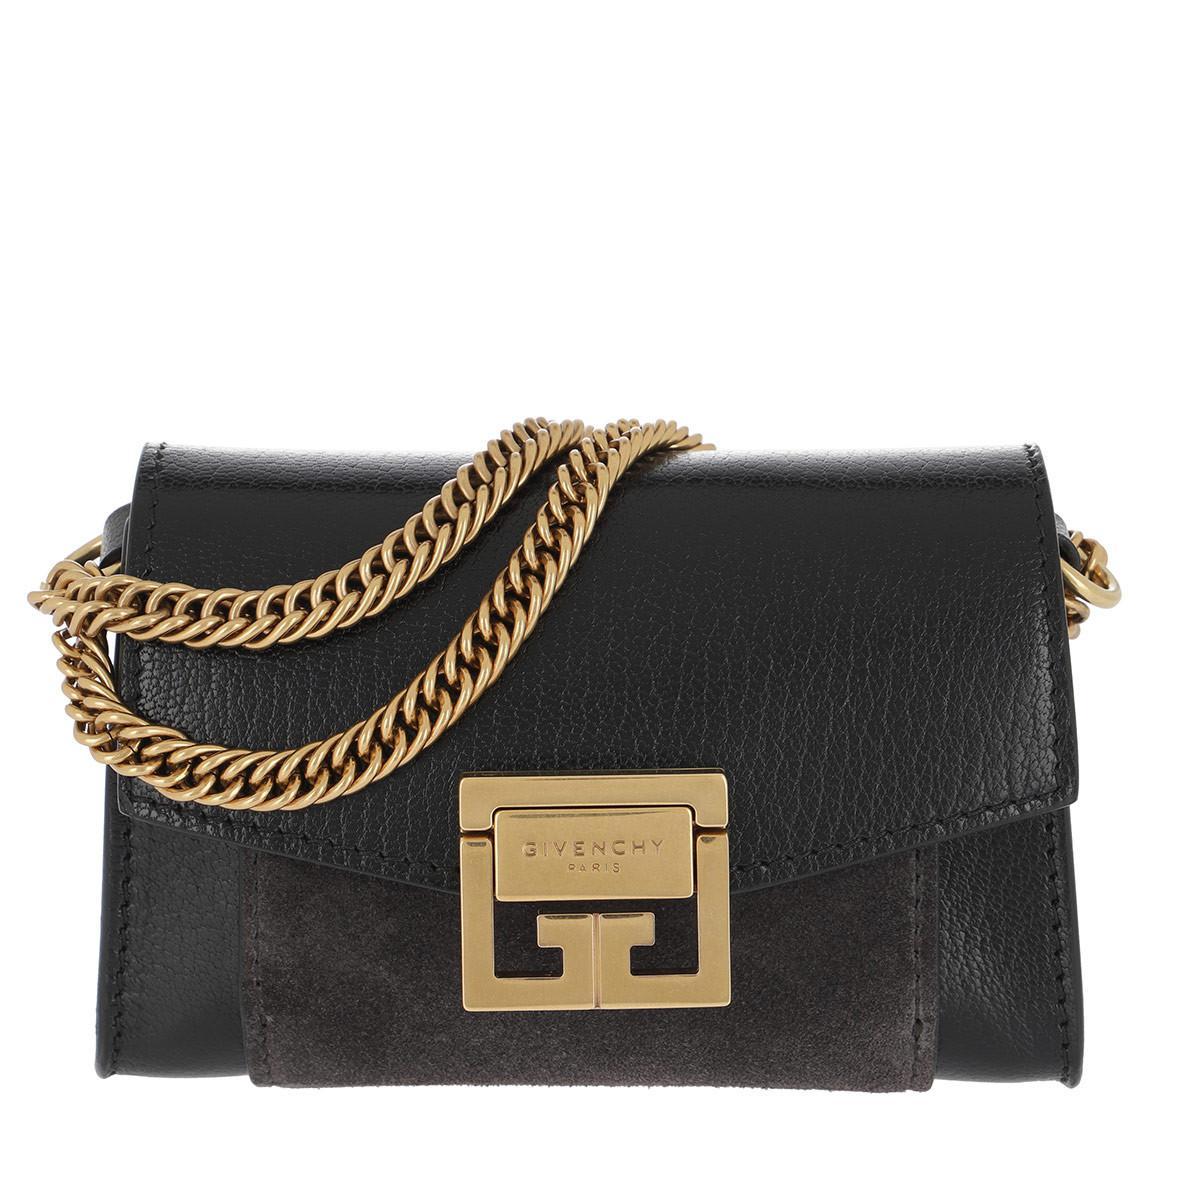 43c5bd417376 Givenchy Gv3 Nano Crossbody Bag Black Grey in Black - Lyst